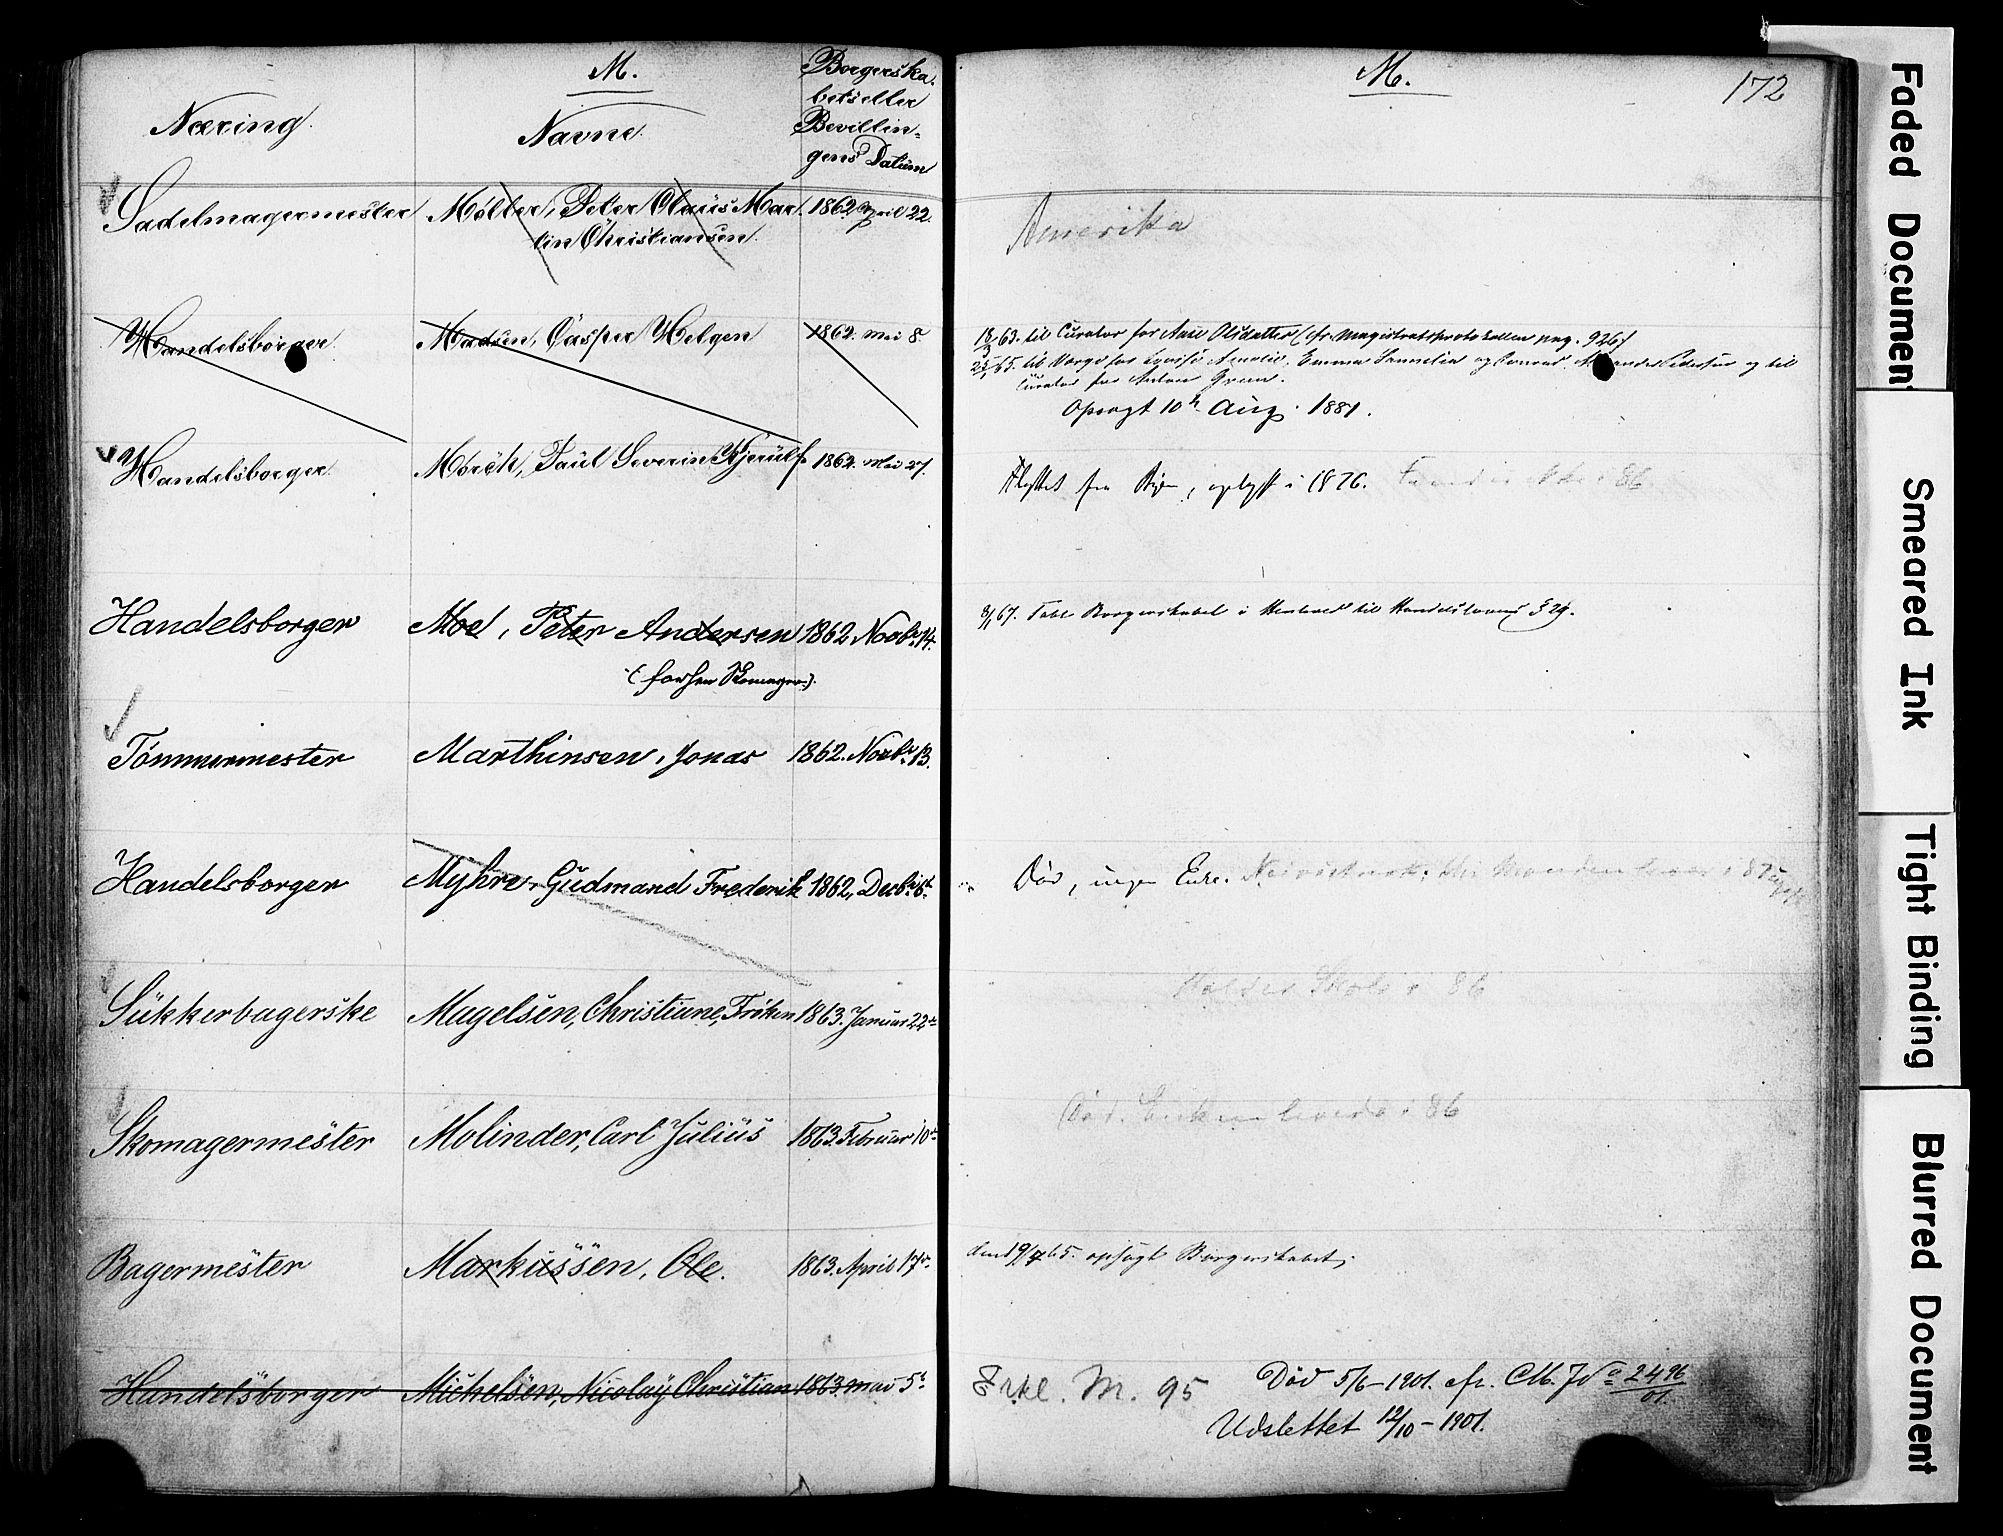 SAO, Kristiania magistrat, F/Fb/L0004: Borgerrulle, 1860-1879, s. 174